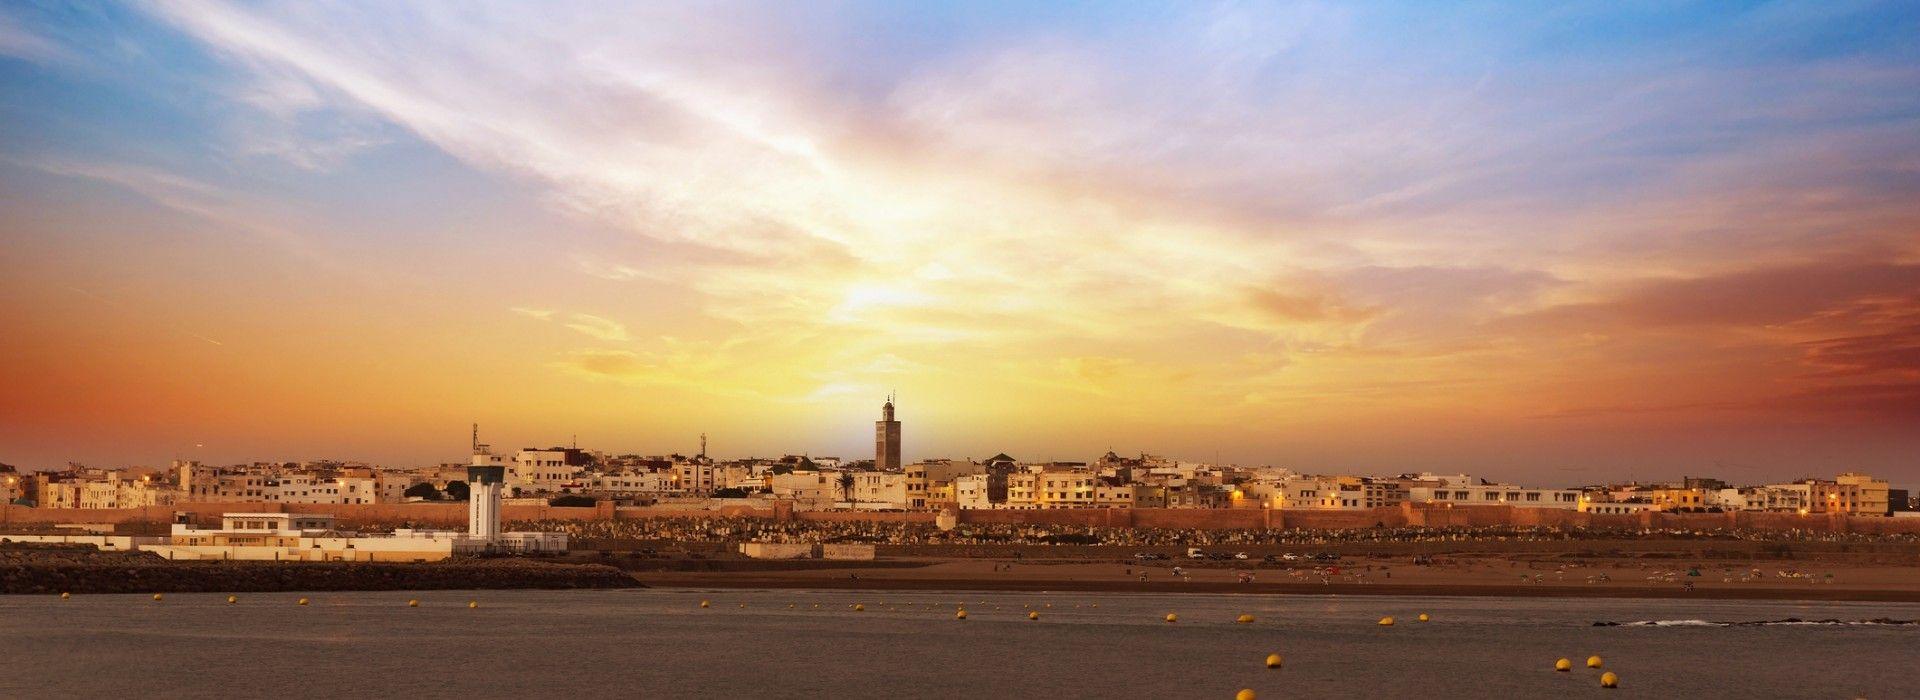 Natural landmarks sightseeing Tours in Marrakech